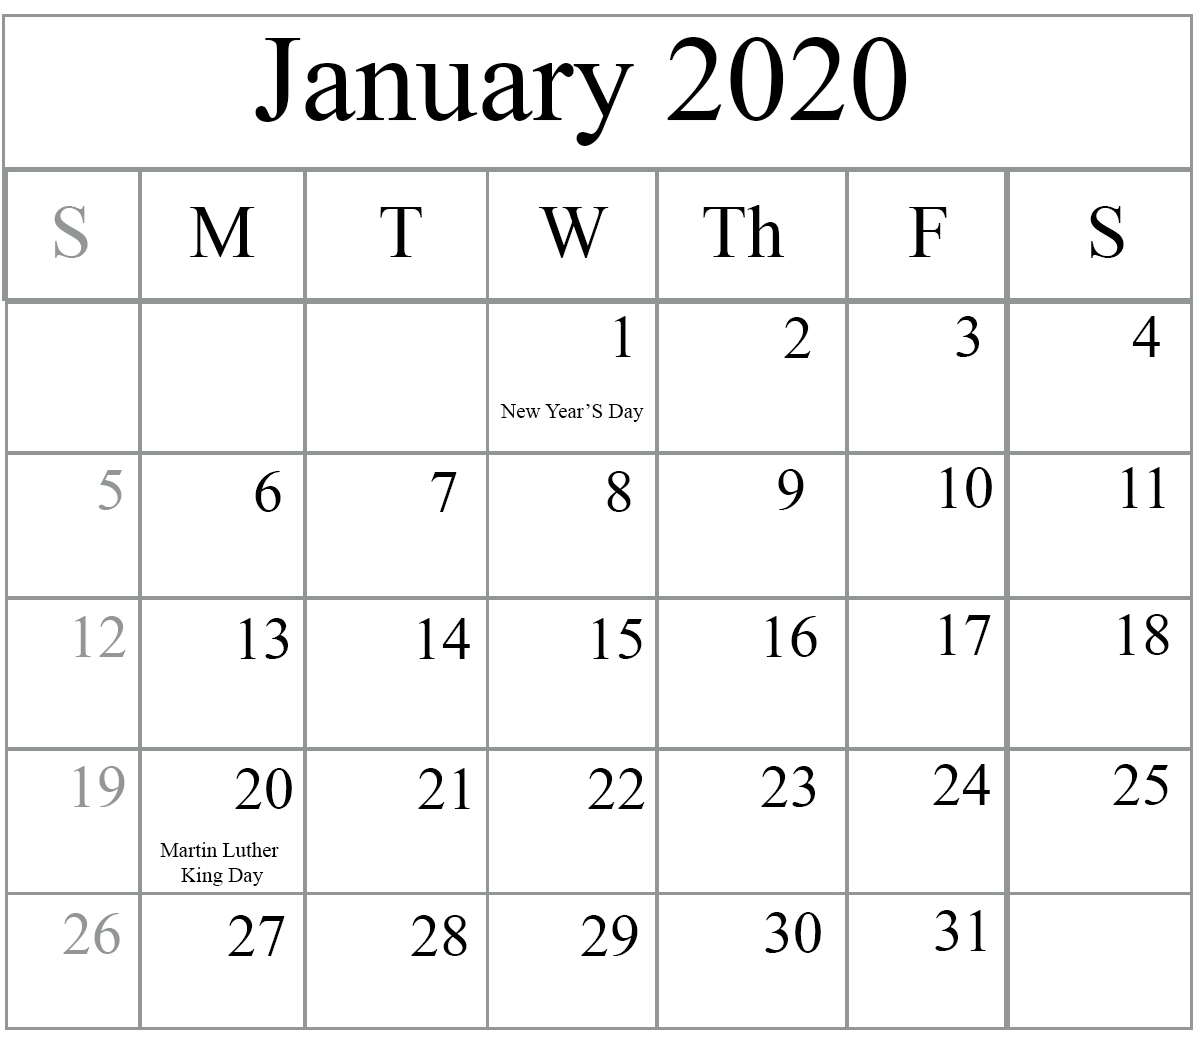 Free January 2020 Printable Calendar In Pdf, Excel & Word-Downloadable 2020 Calendar Template Word